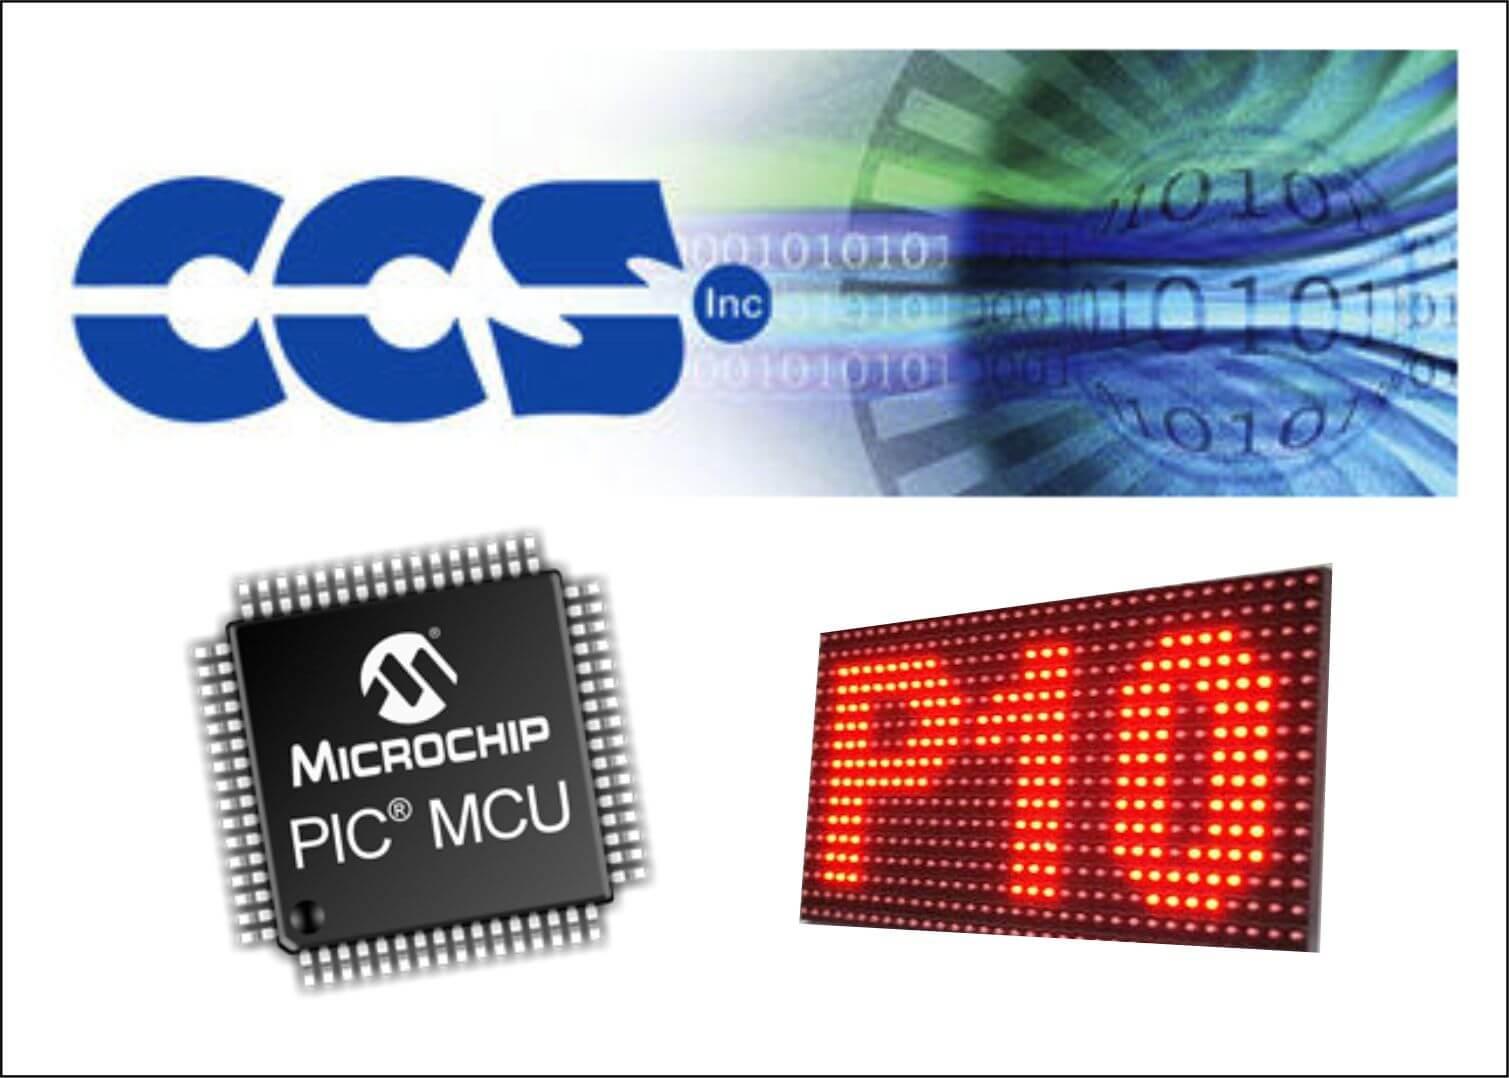 Panel Led con PIC y Matriz led 16x32 en CCS